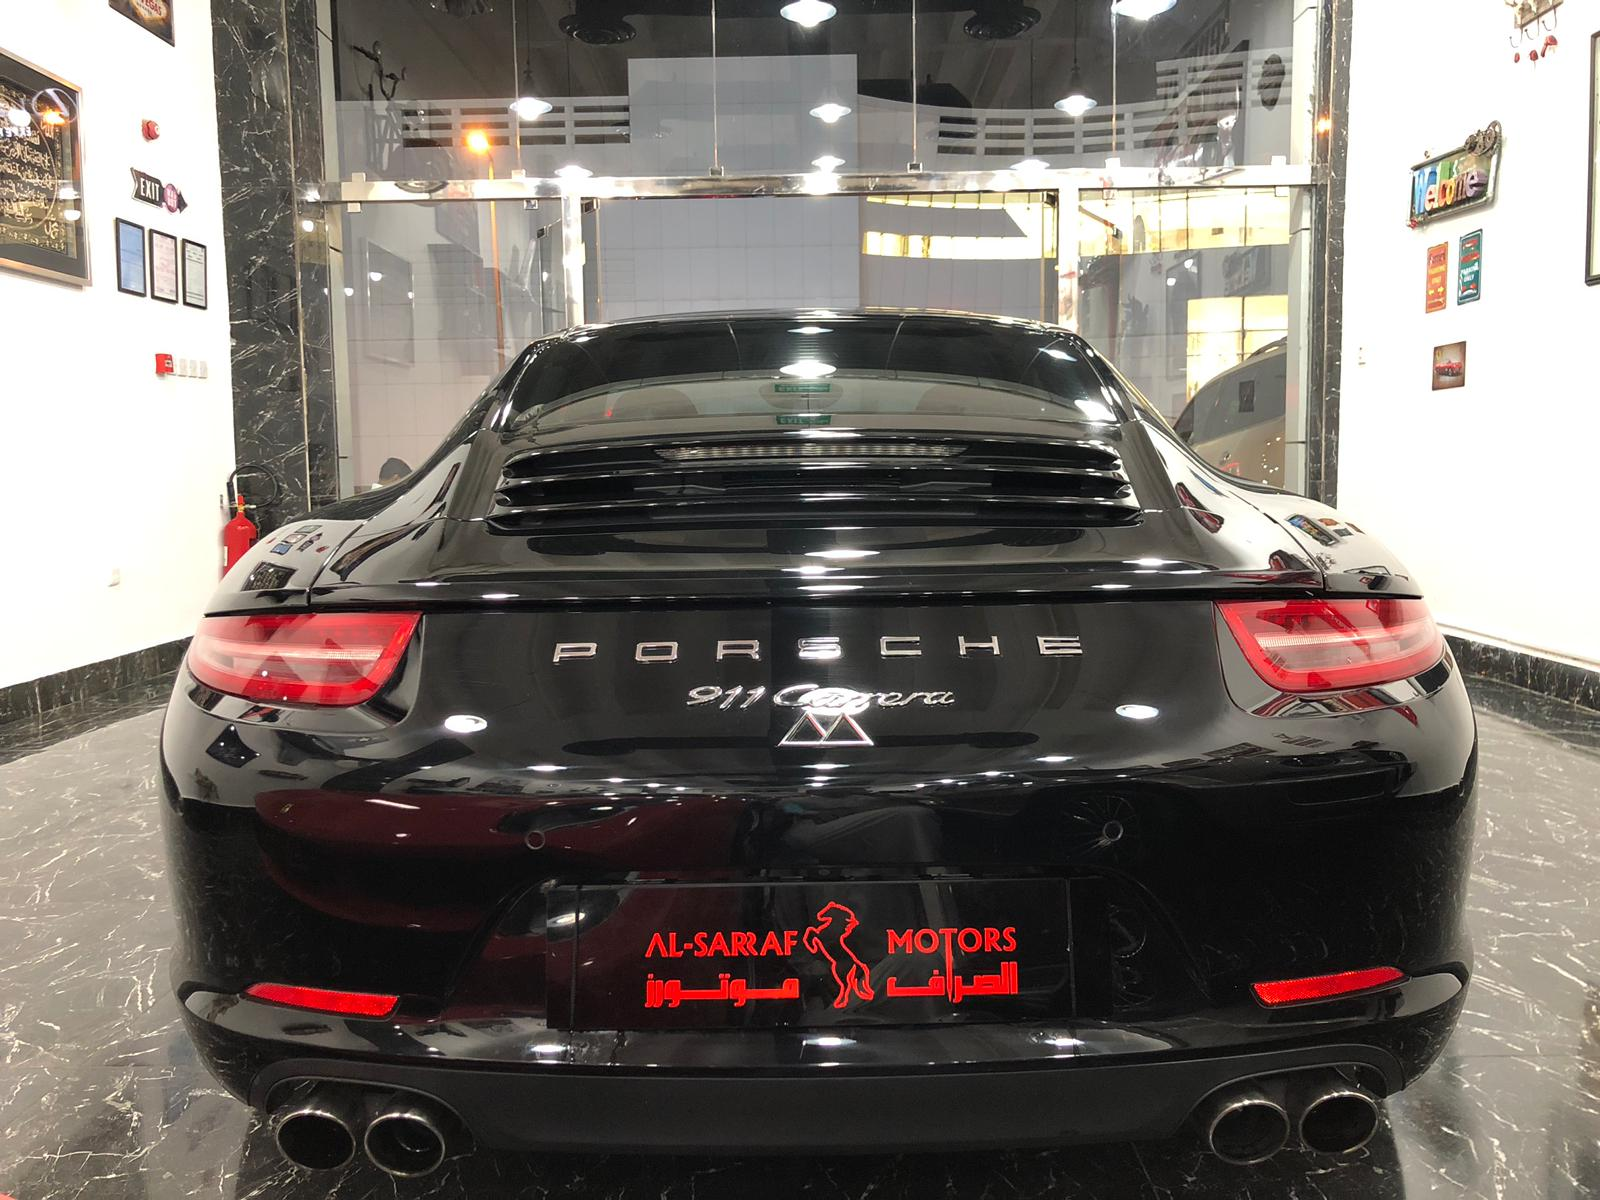 e62e4db12 Porsche 911 carrera 2015 بورشه ٩١١ كاريرا ٢٠١٥ — Q8RIDER